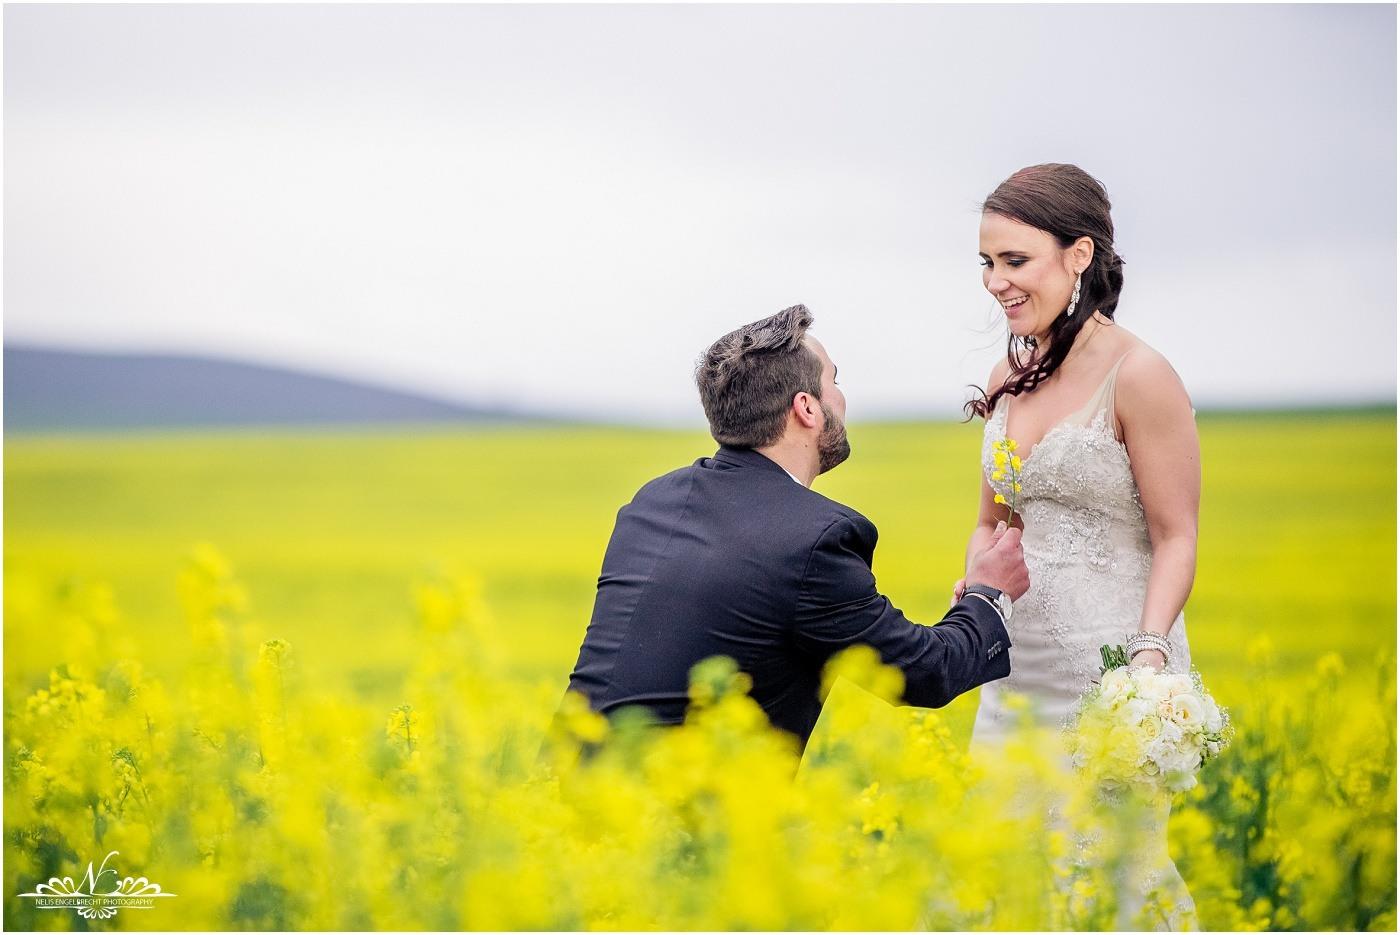 Eensgezind-Wedding-Photos-Nelis-Engelbrecht-Photography-137